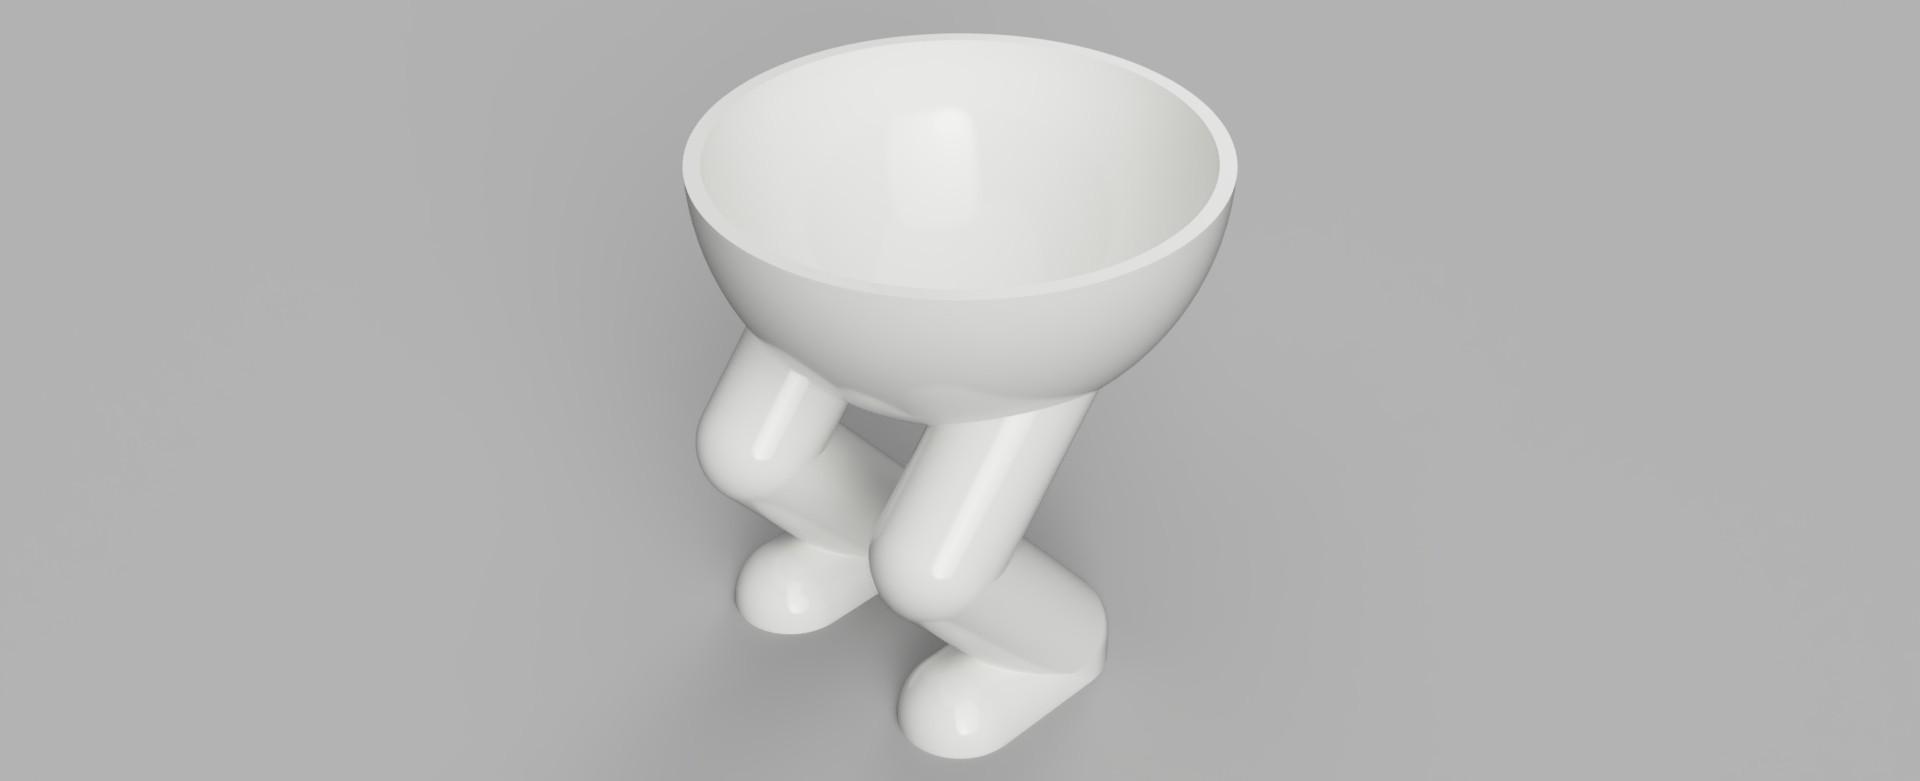 Planter_3_2018-Aug-31_10-28-38PM-000_CustomizedView5151853315_jpg.jpg Download free STL file Squatting Planter • 3D printable object, benwax10